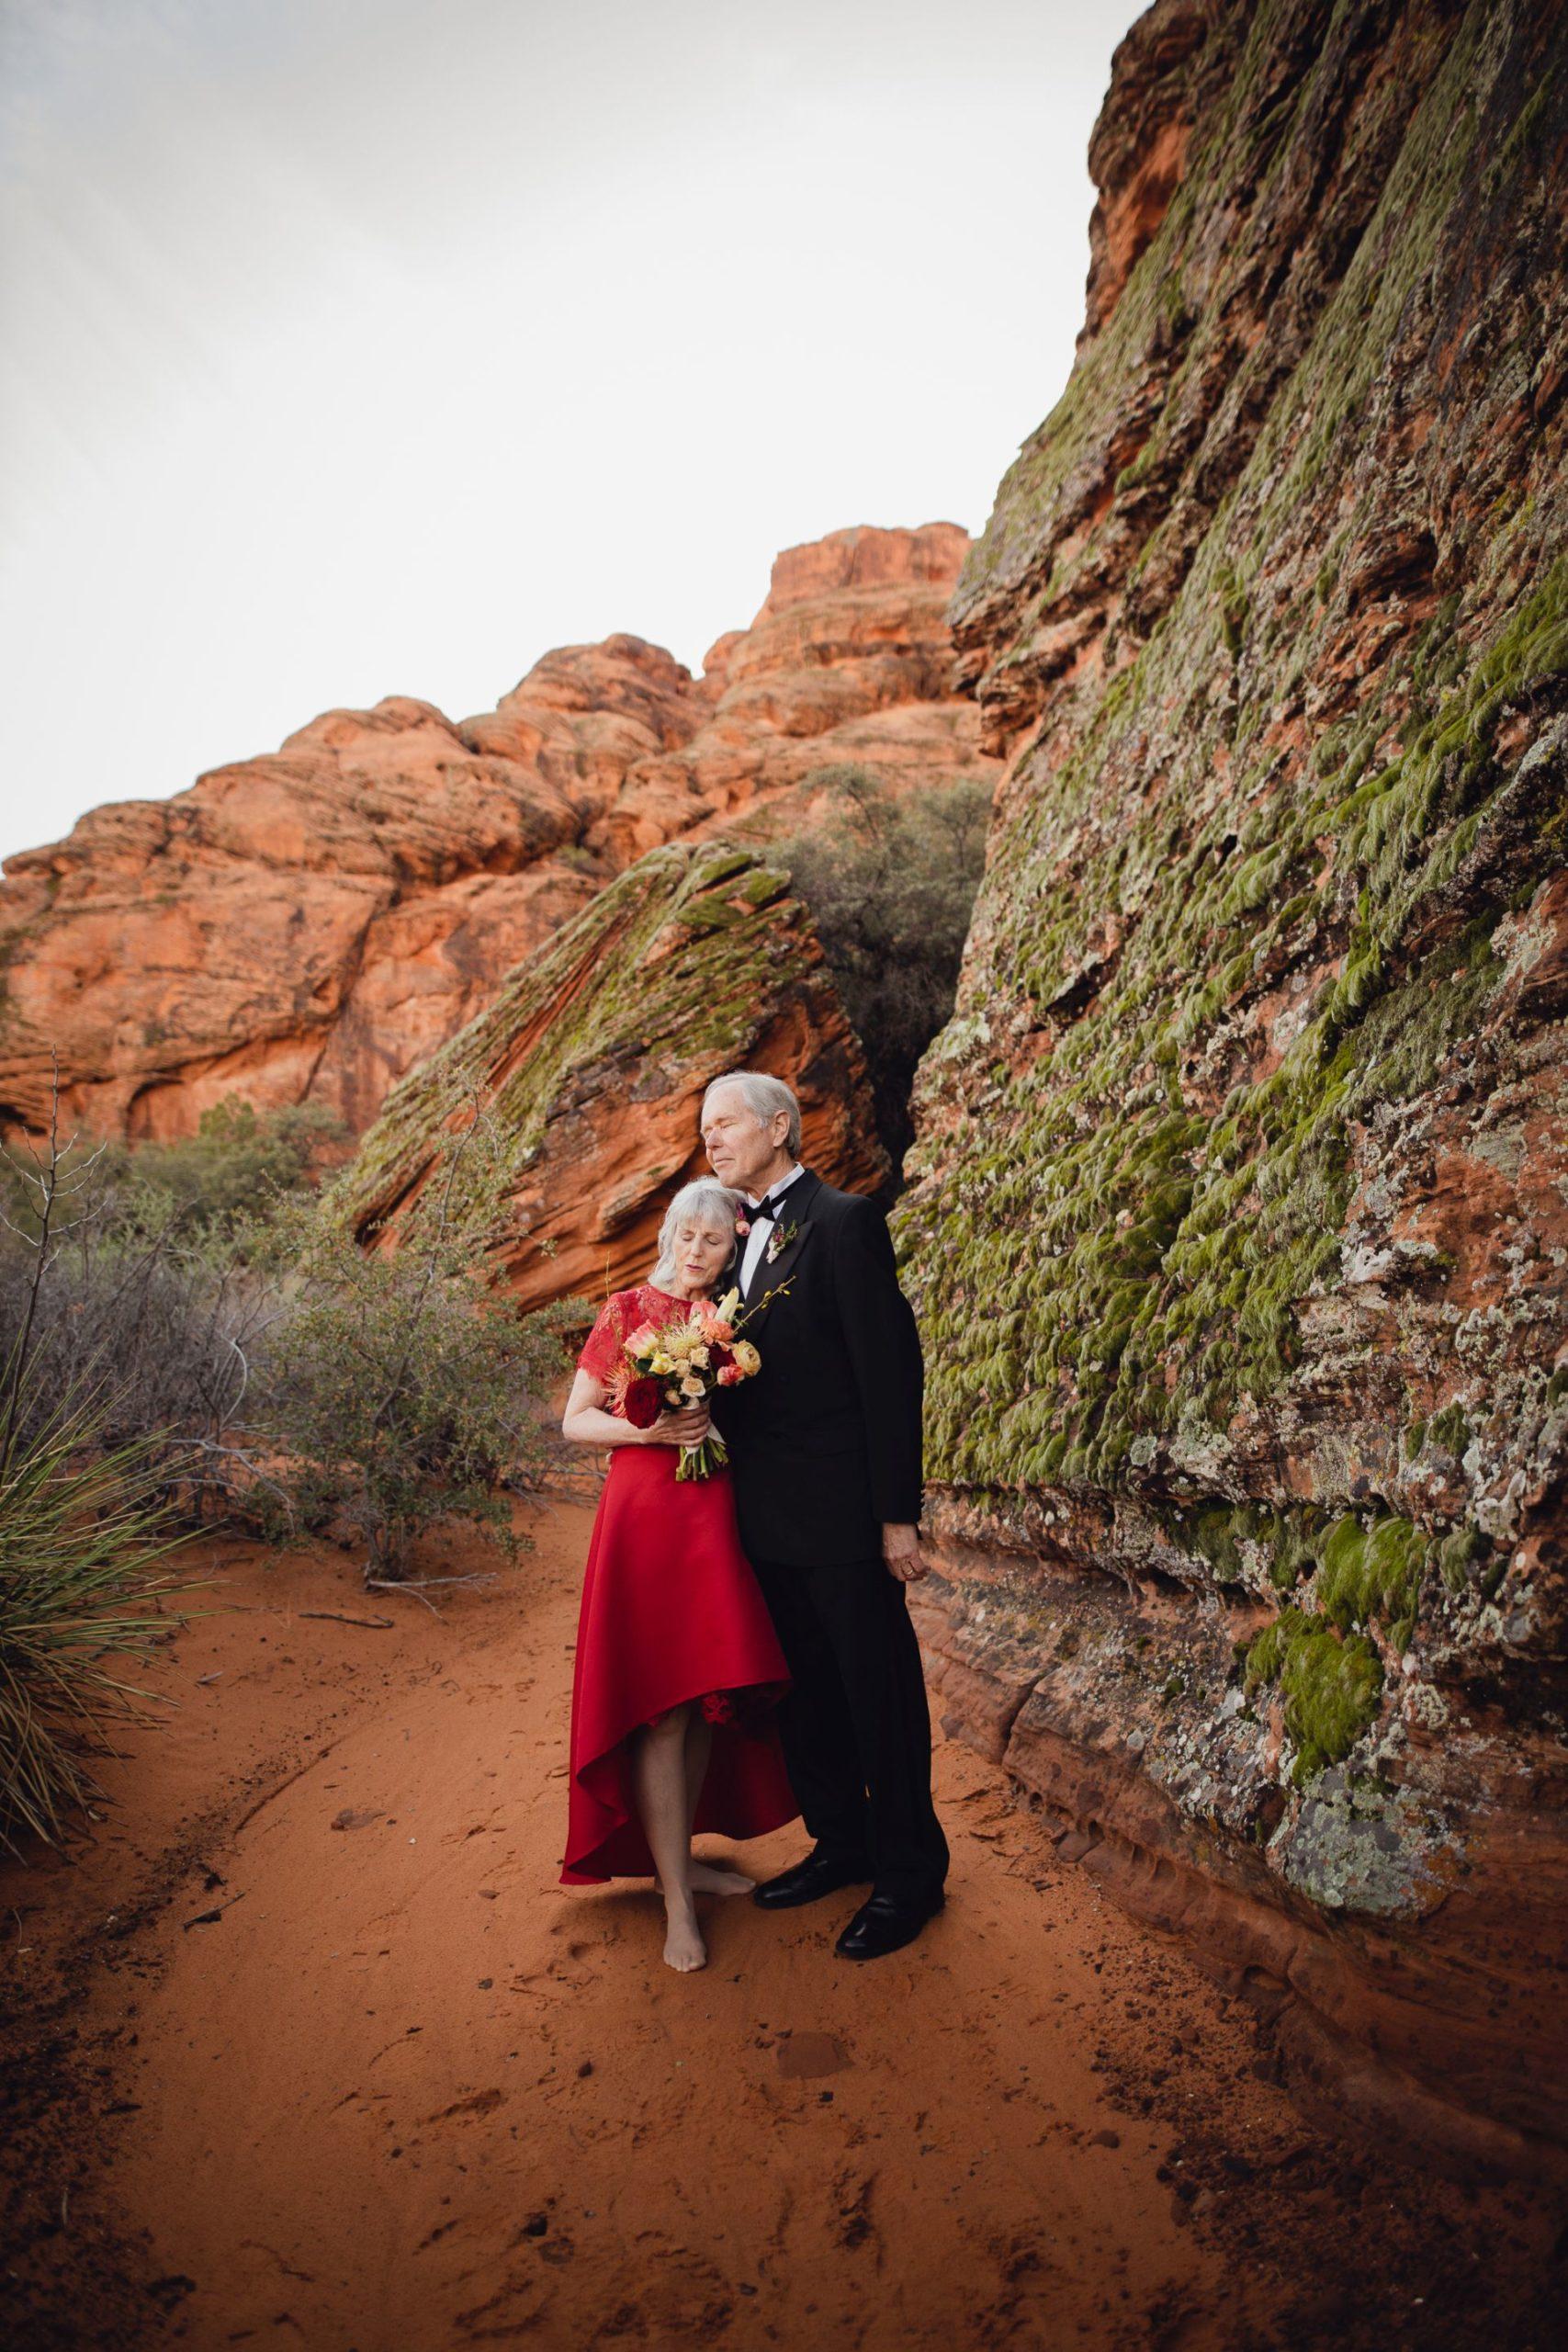 adventure wedding desert utah - couple in intimate hug during their elopement